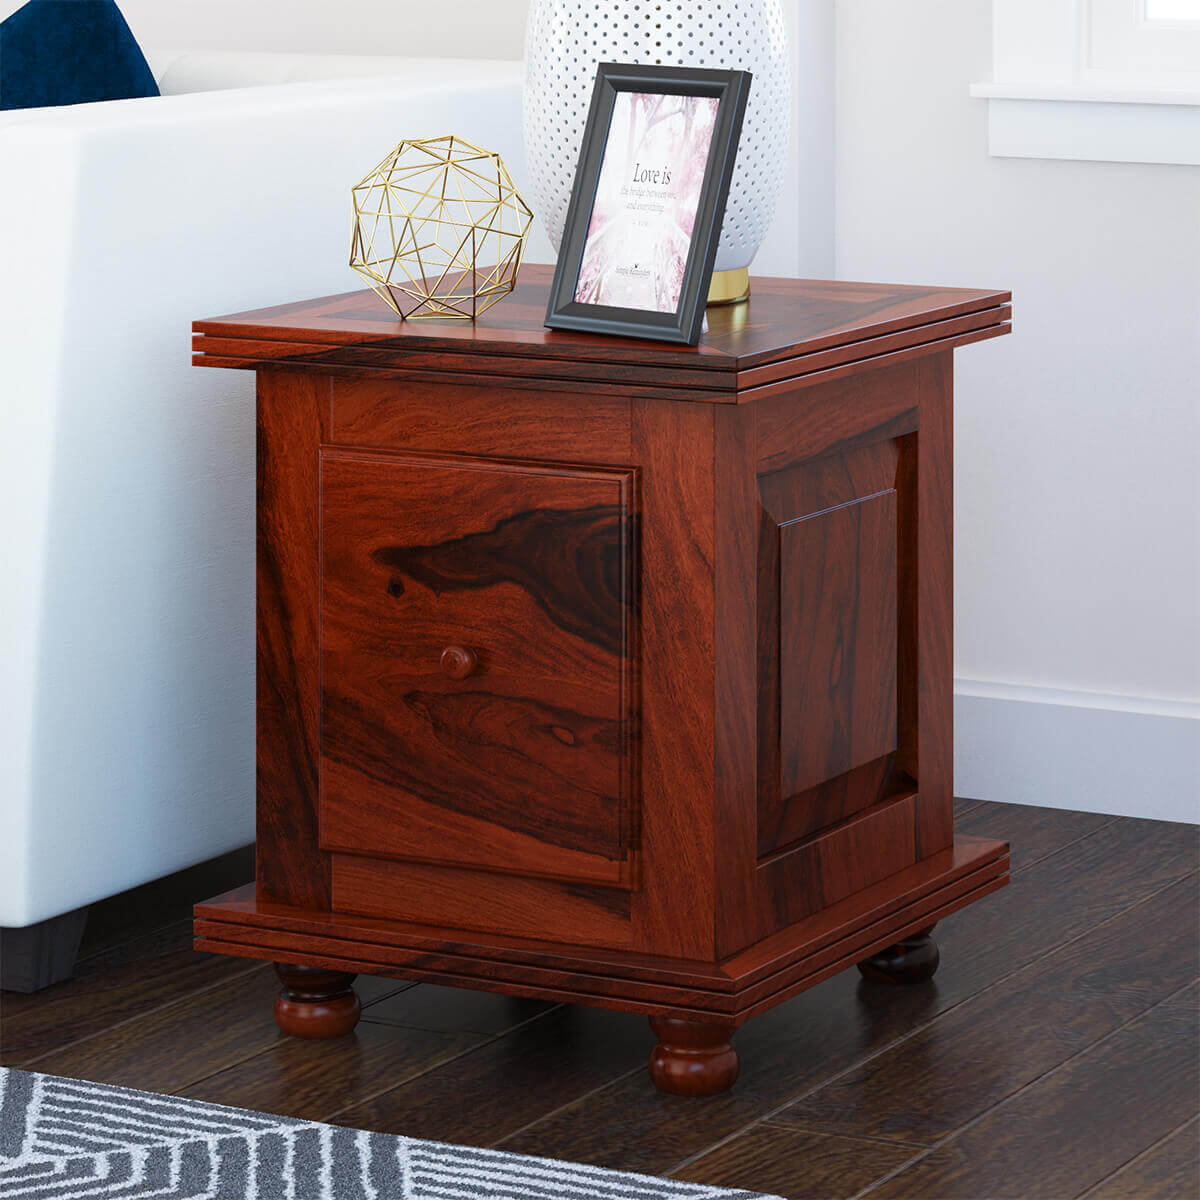 Arca Rustic Solid Wood 1 Drawer Storage End Table